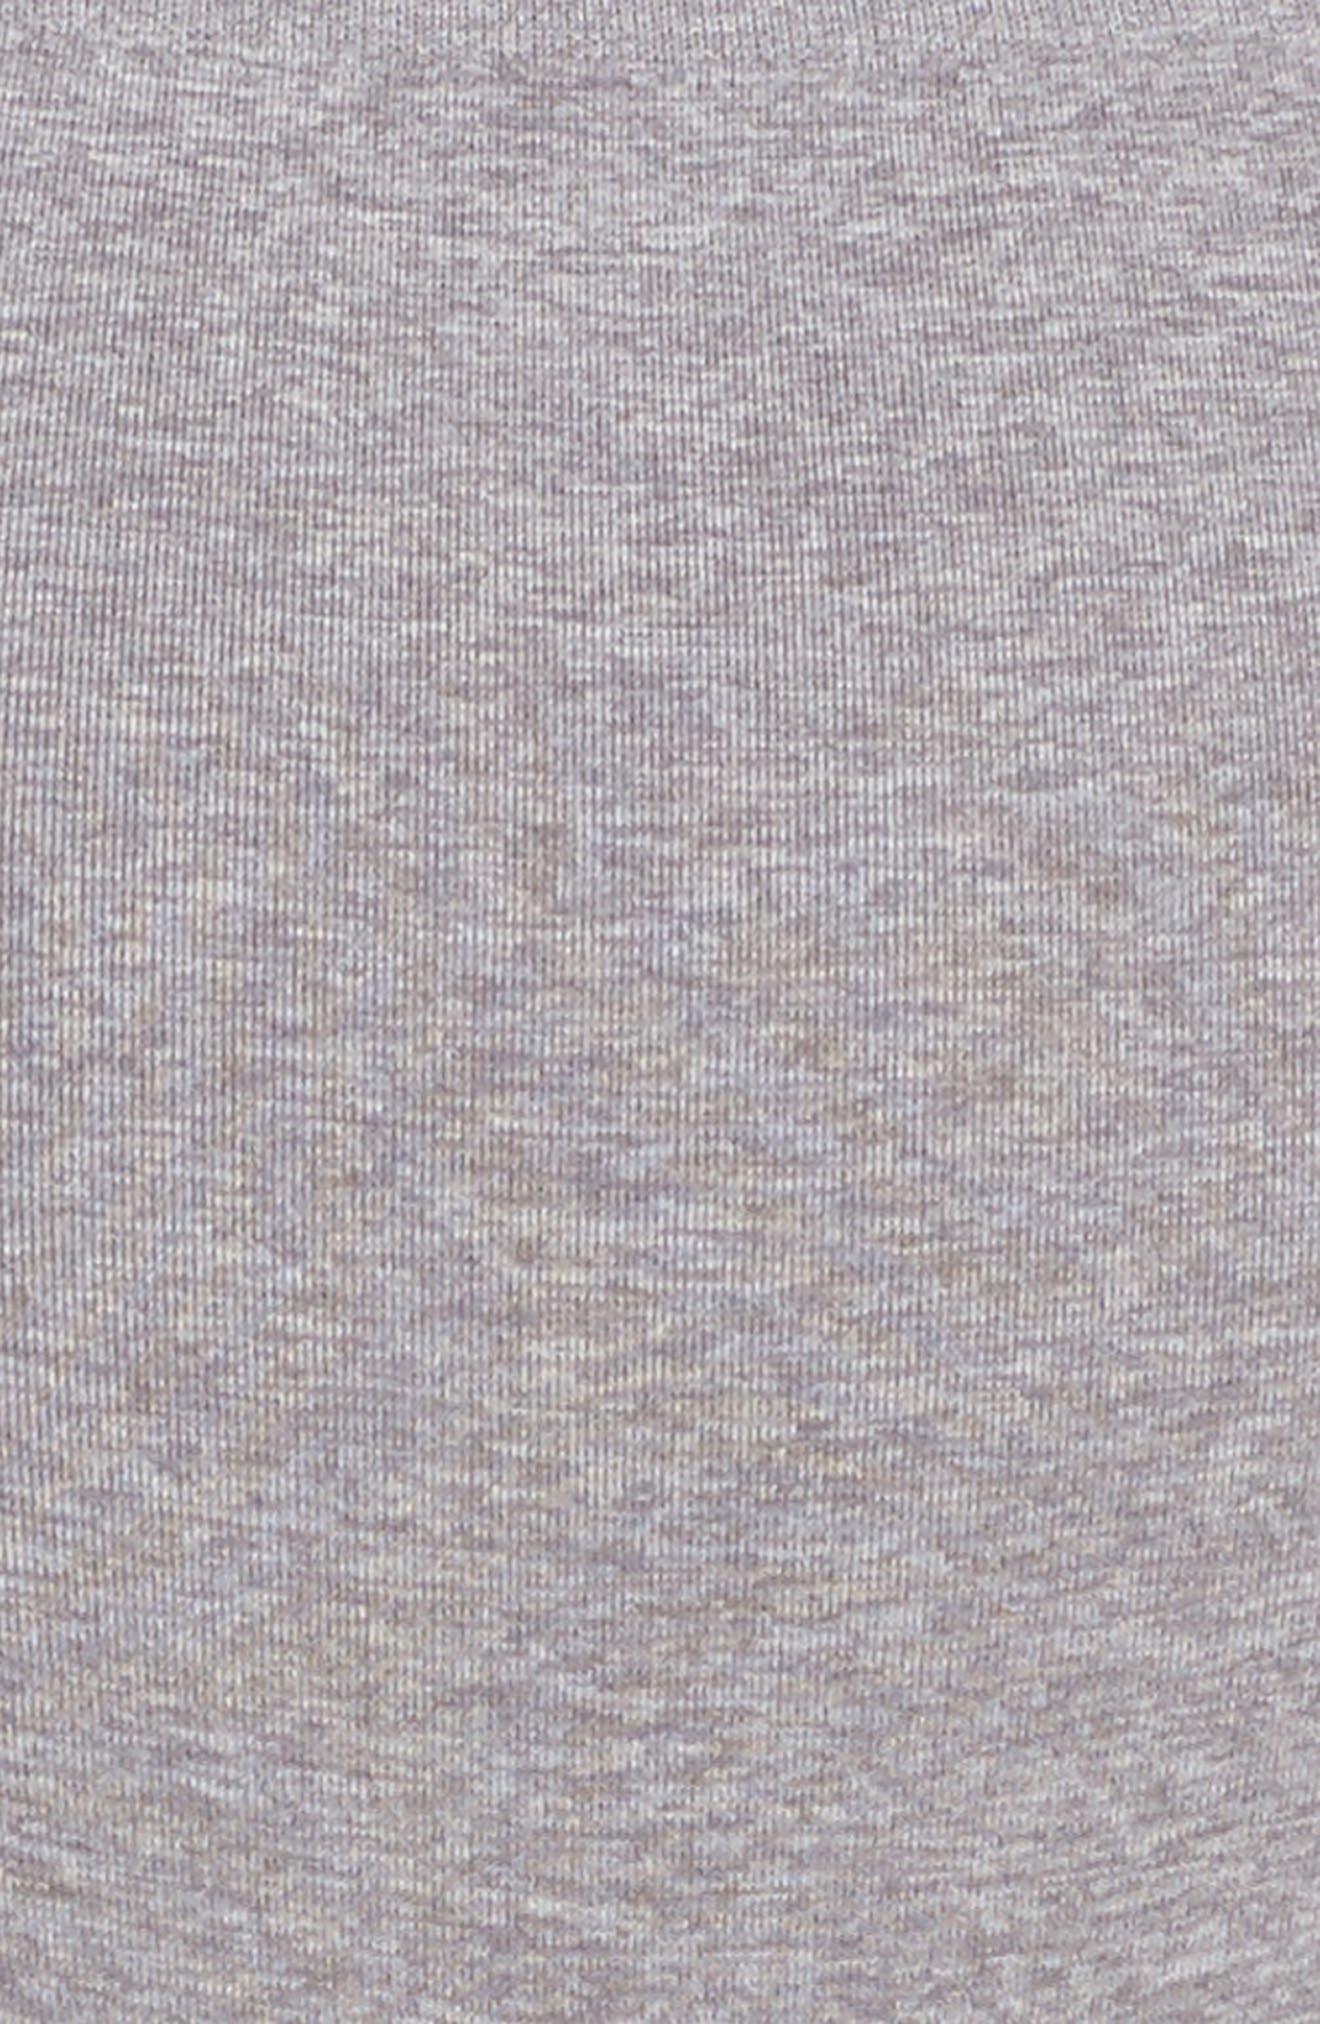 High Waist Seamless Briefs,                             Alternate thumbnail 4, color,                             Grey Excalibur Heather